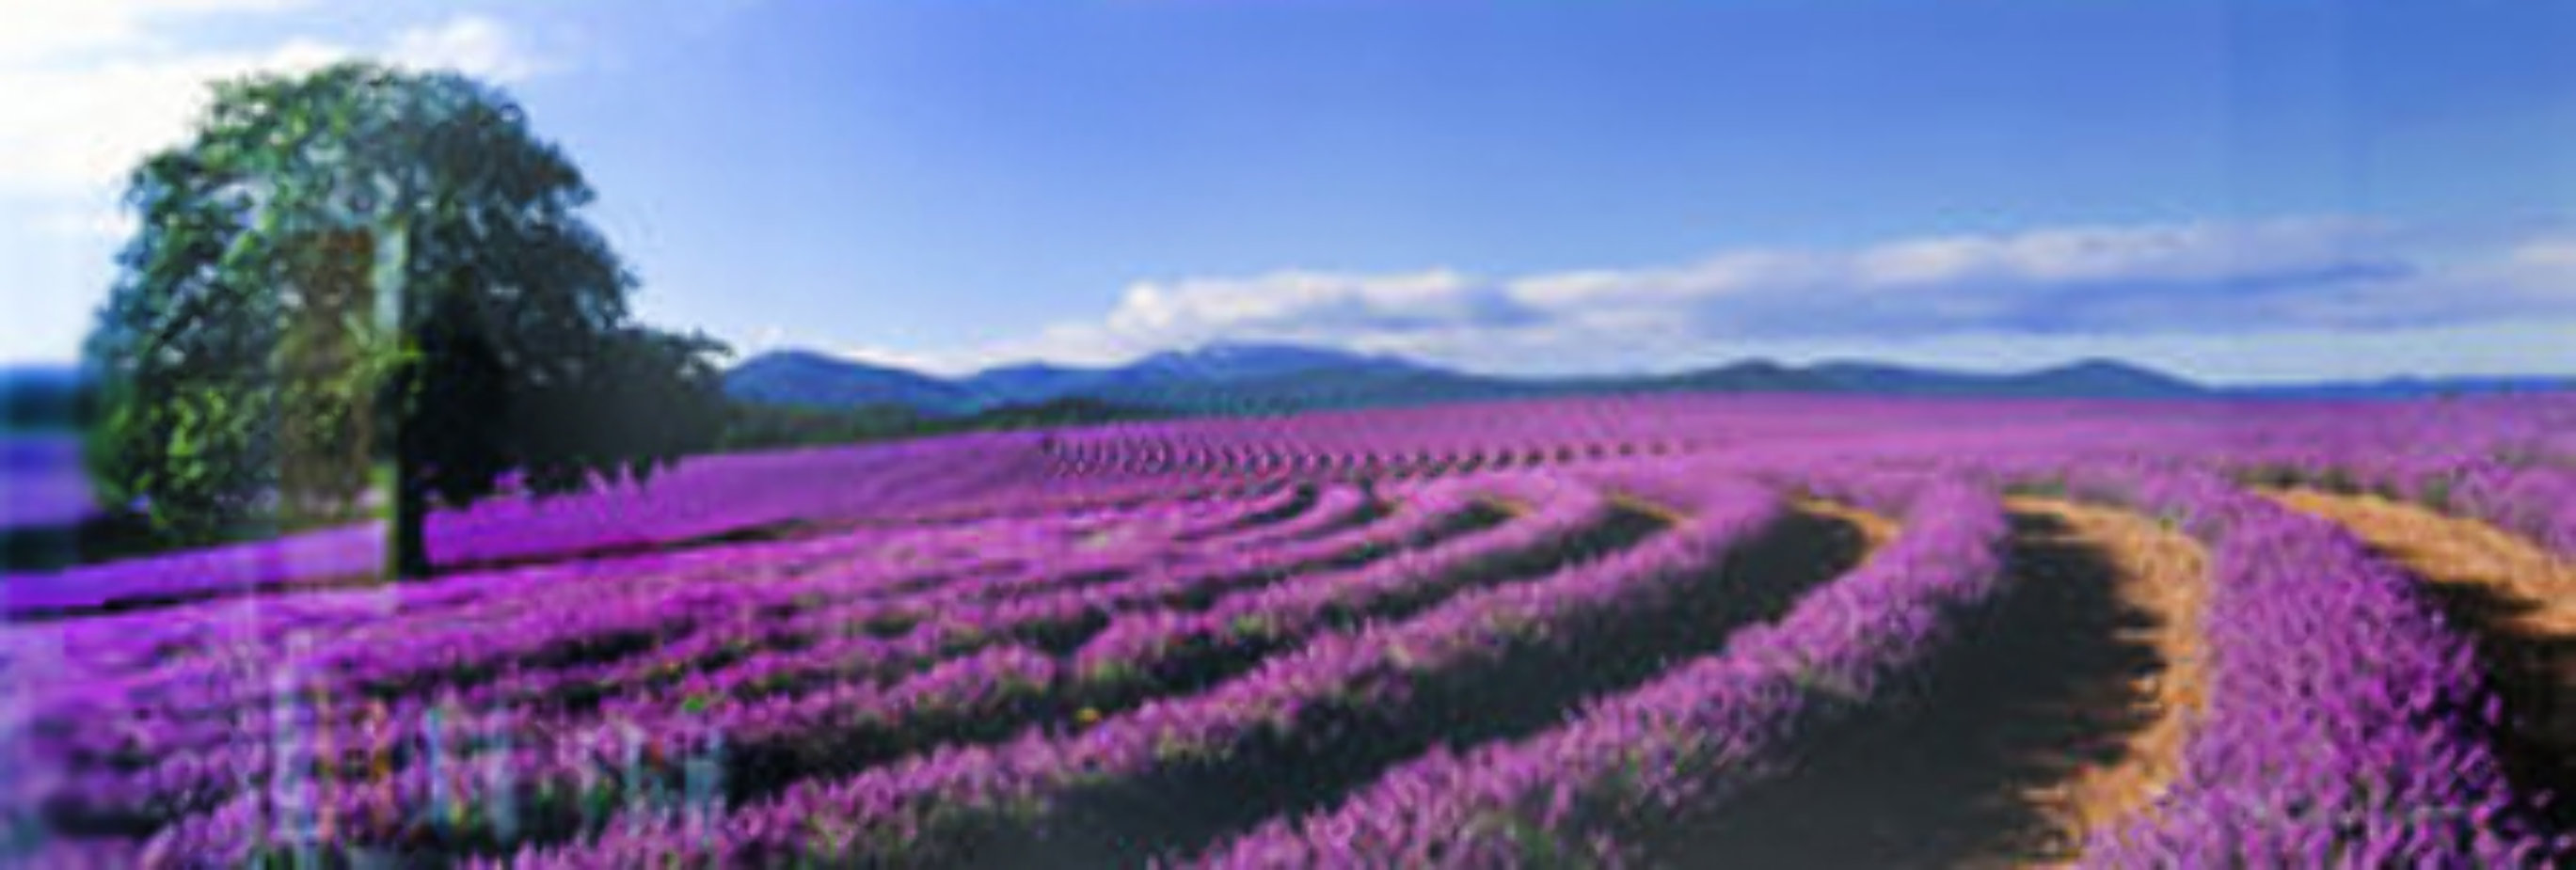 Lavender Sea (Tasmania, Australia) 1.5 M Huge Panorama by Peter Lik